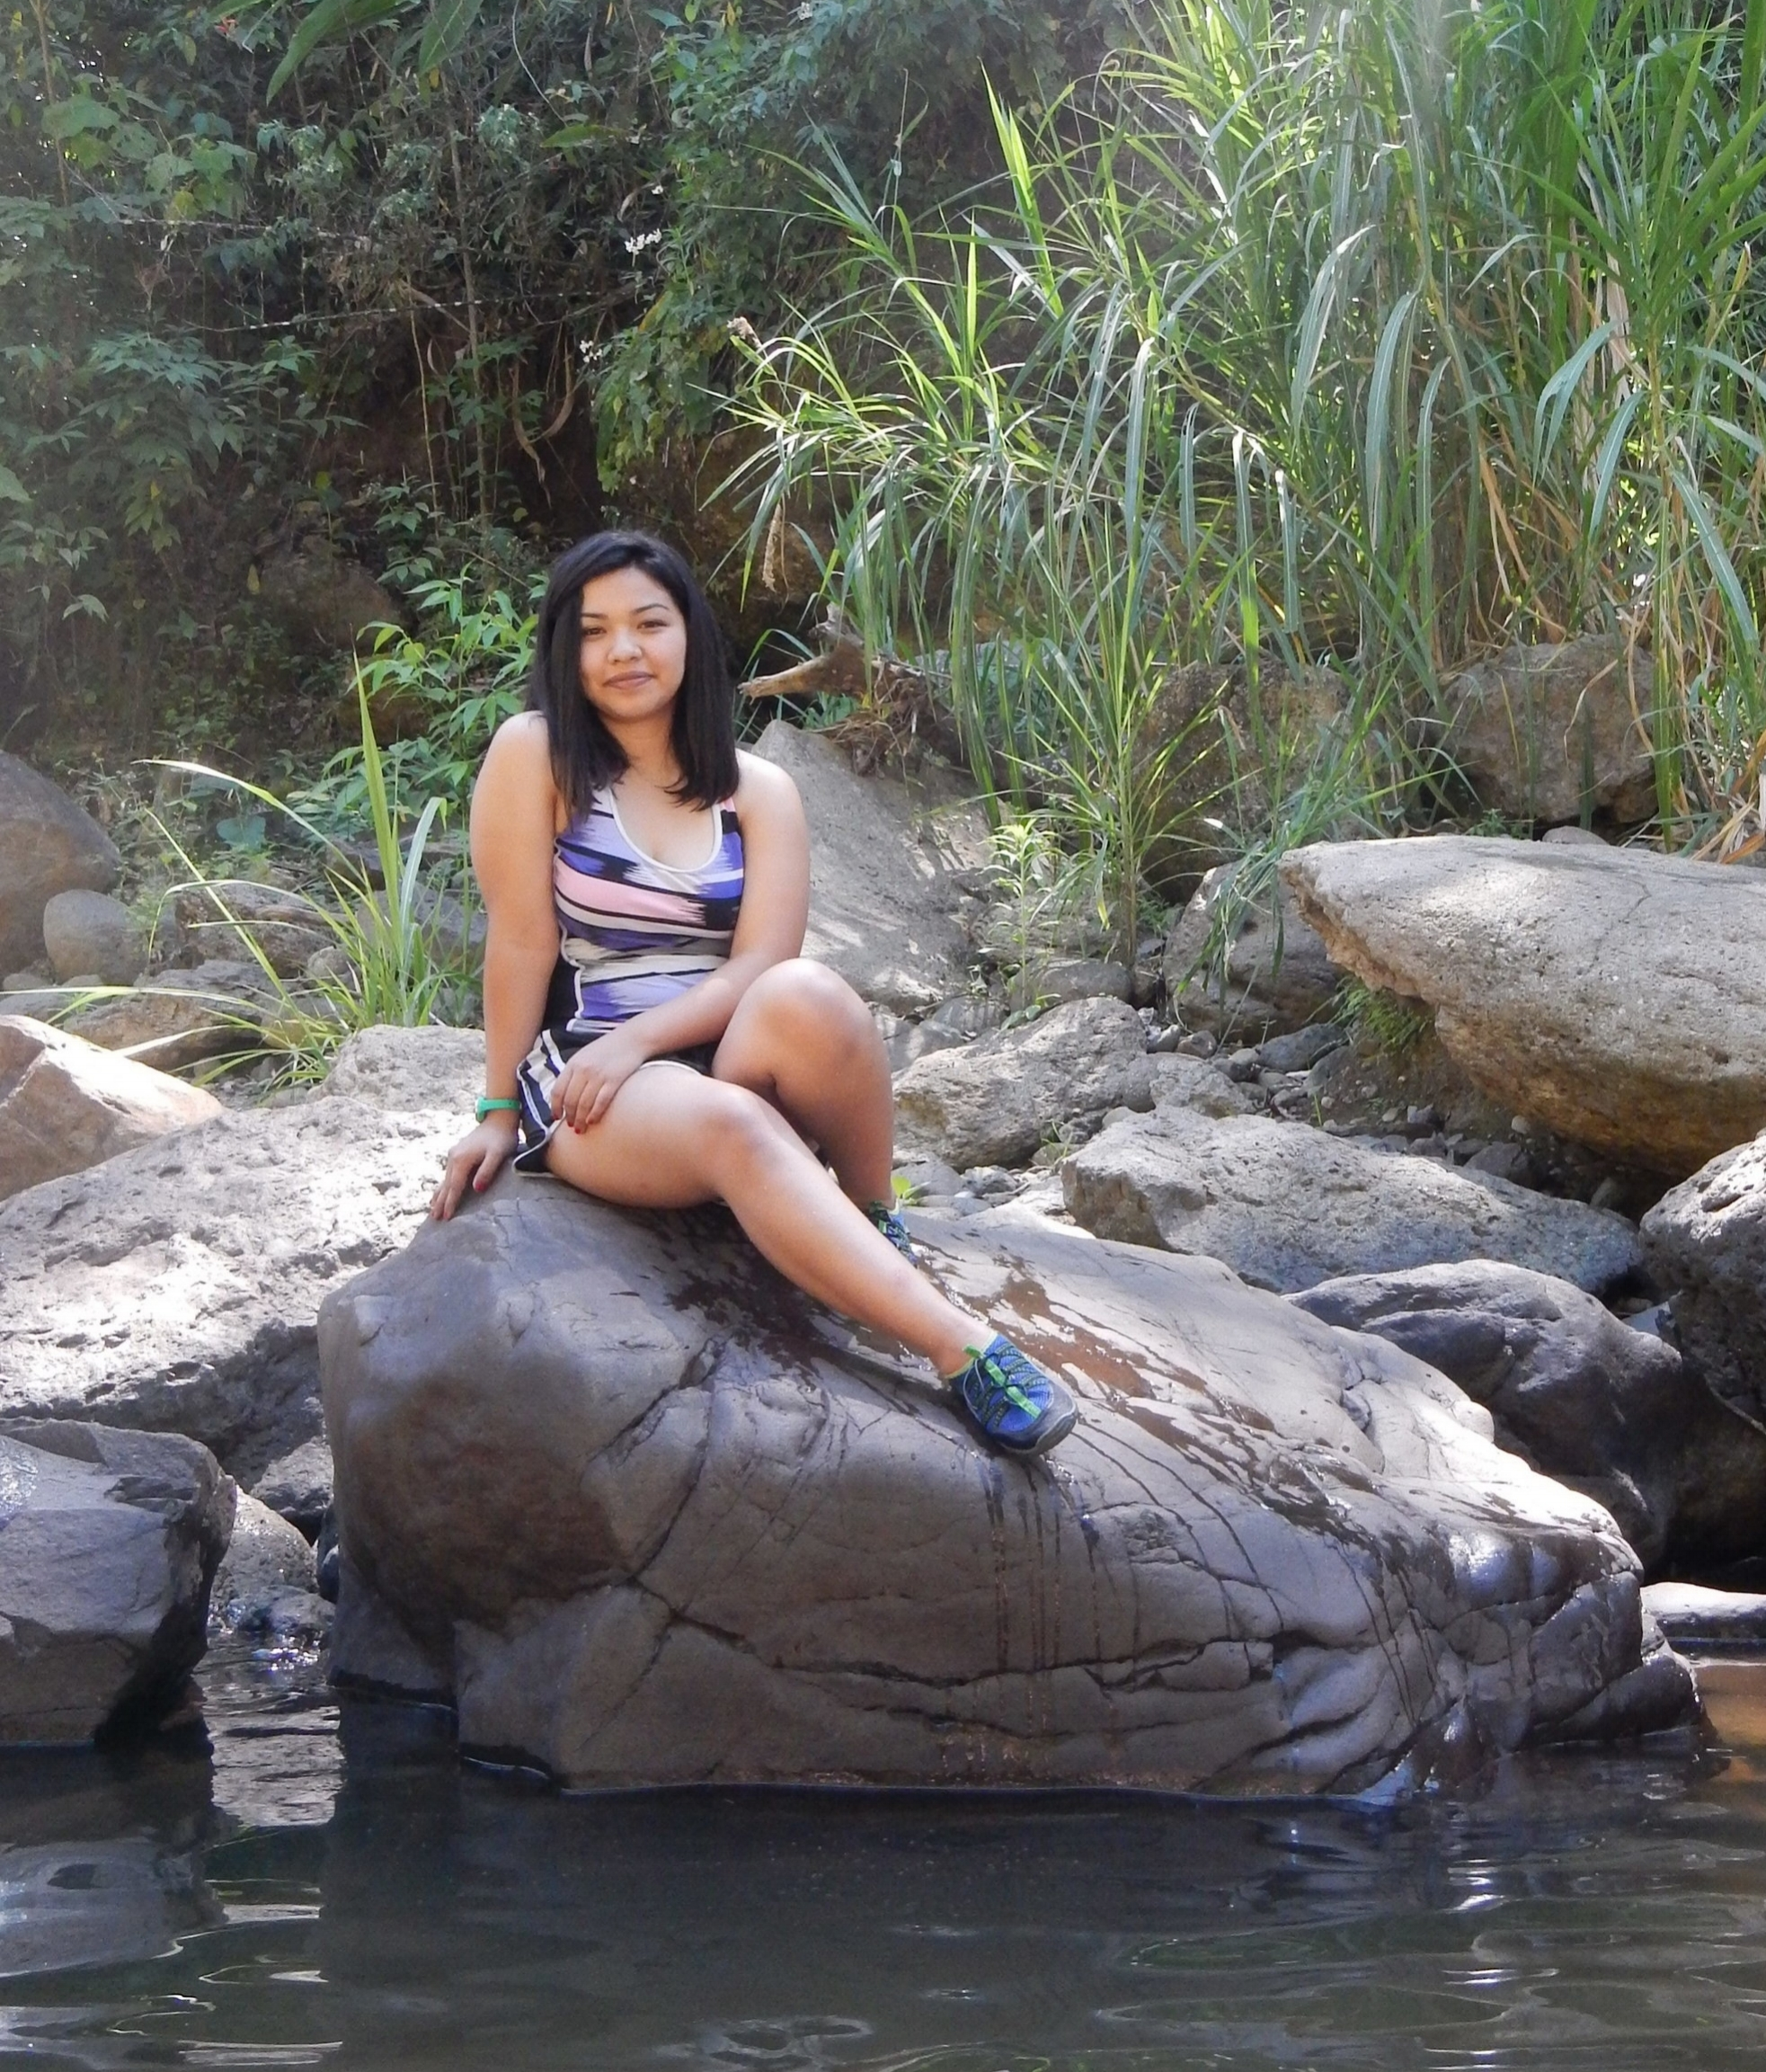 Arisbeth in Nicaragua.